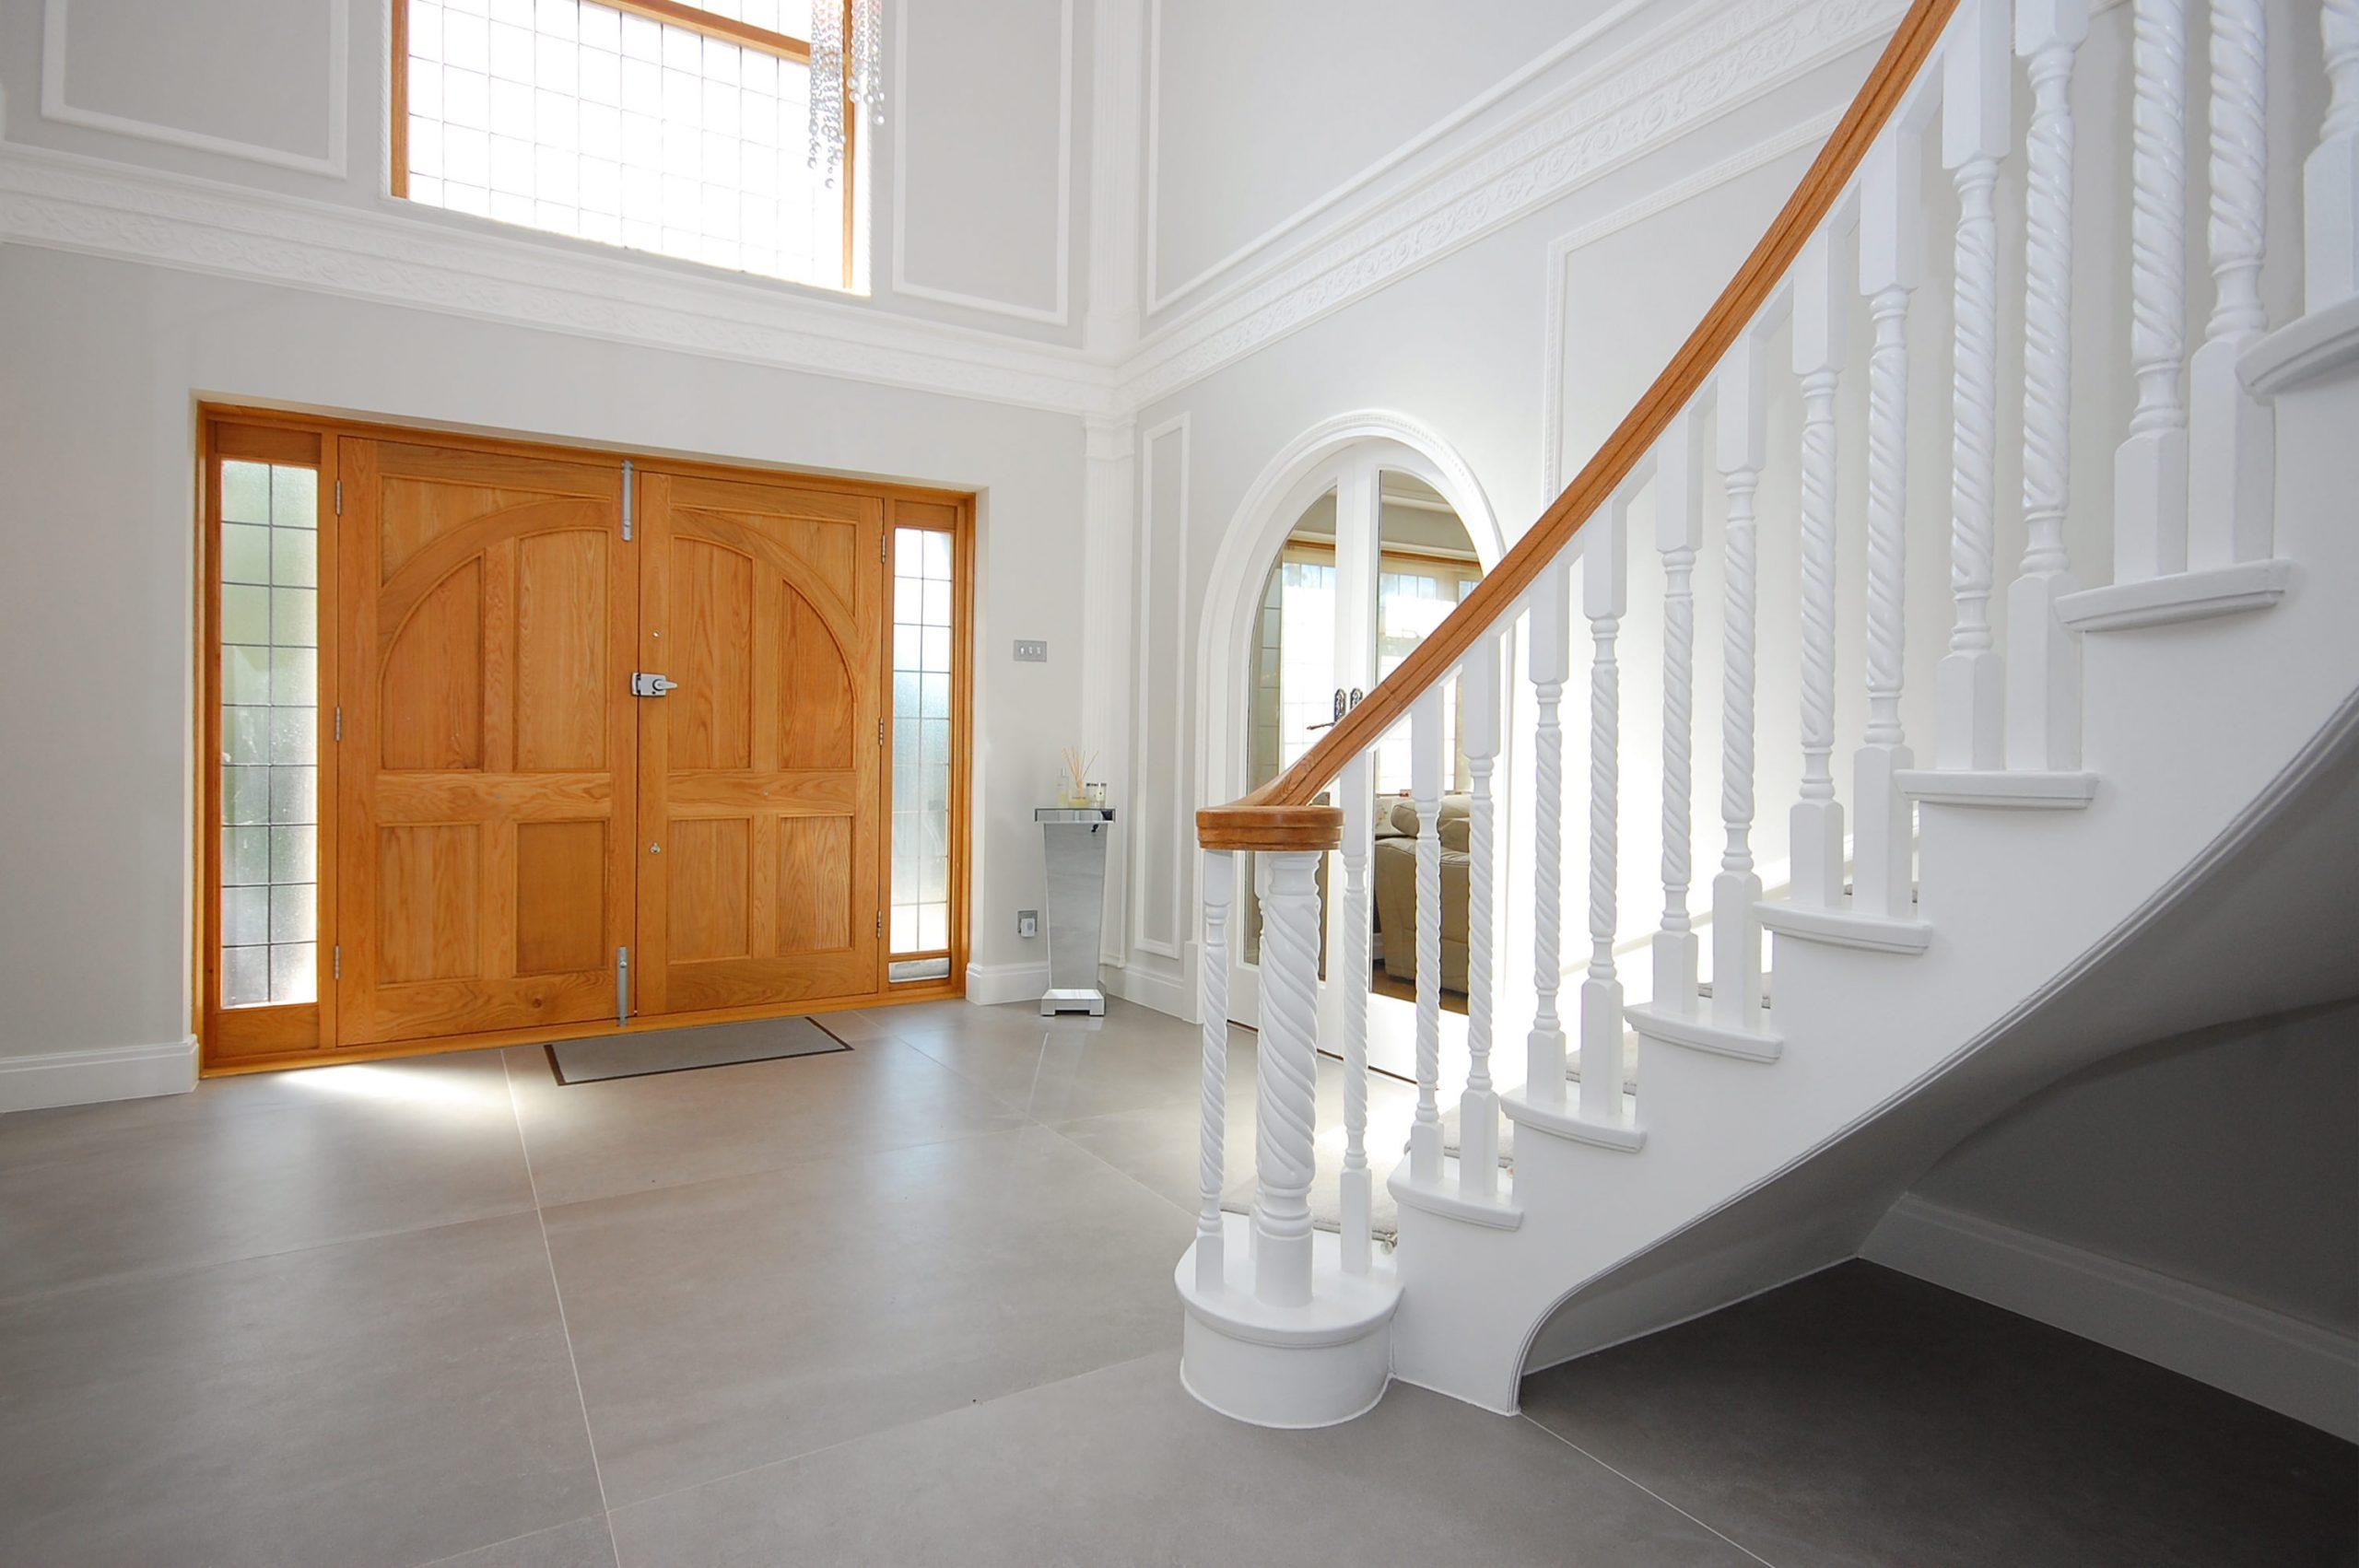 Chigwell Residential Refurb Extension Entrance Hallway